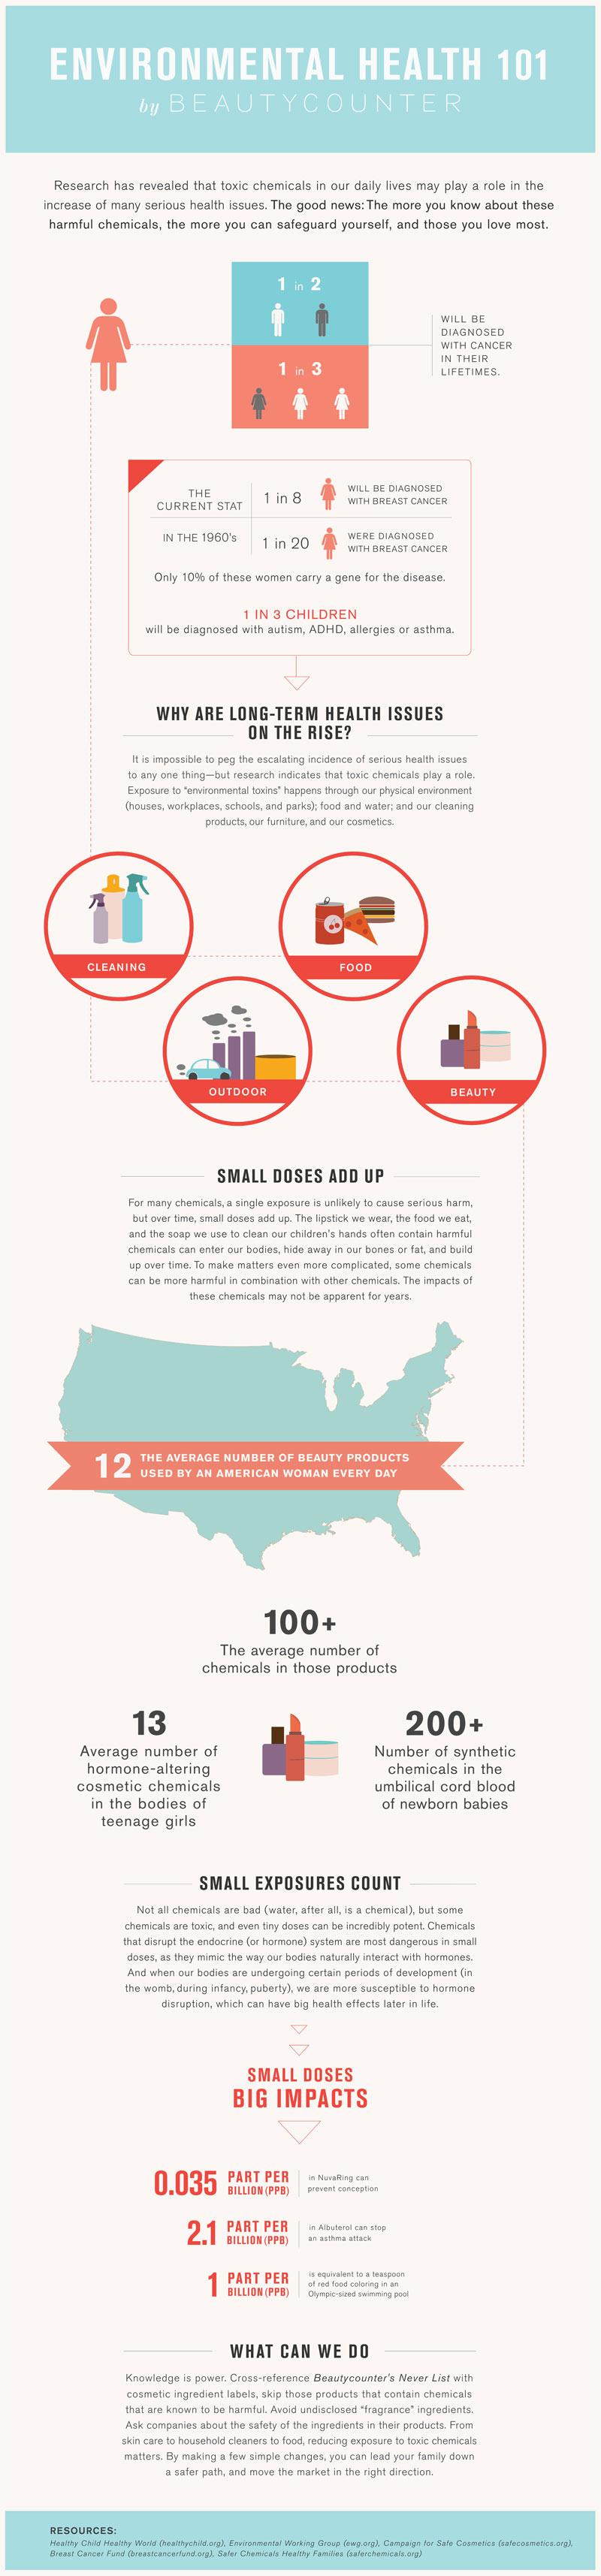 beautycounter_infographic_environmentalhealth101